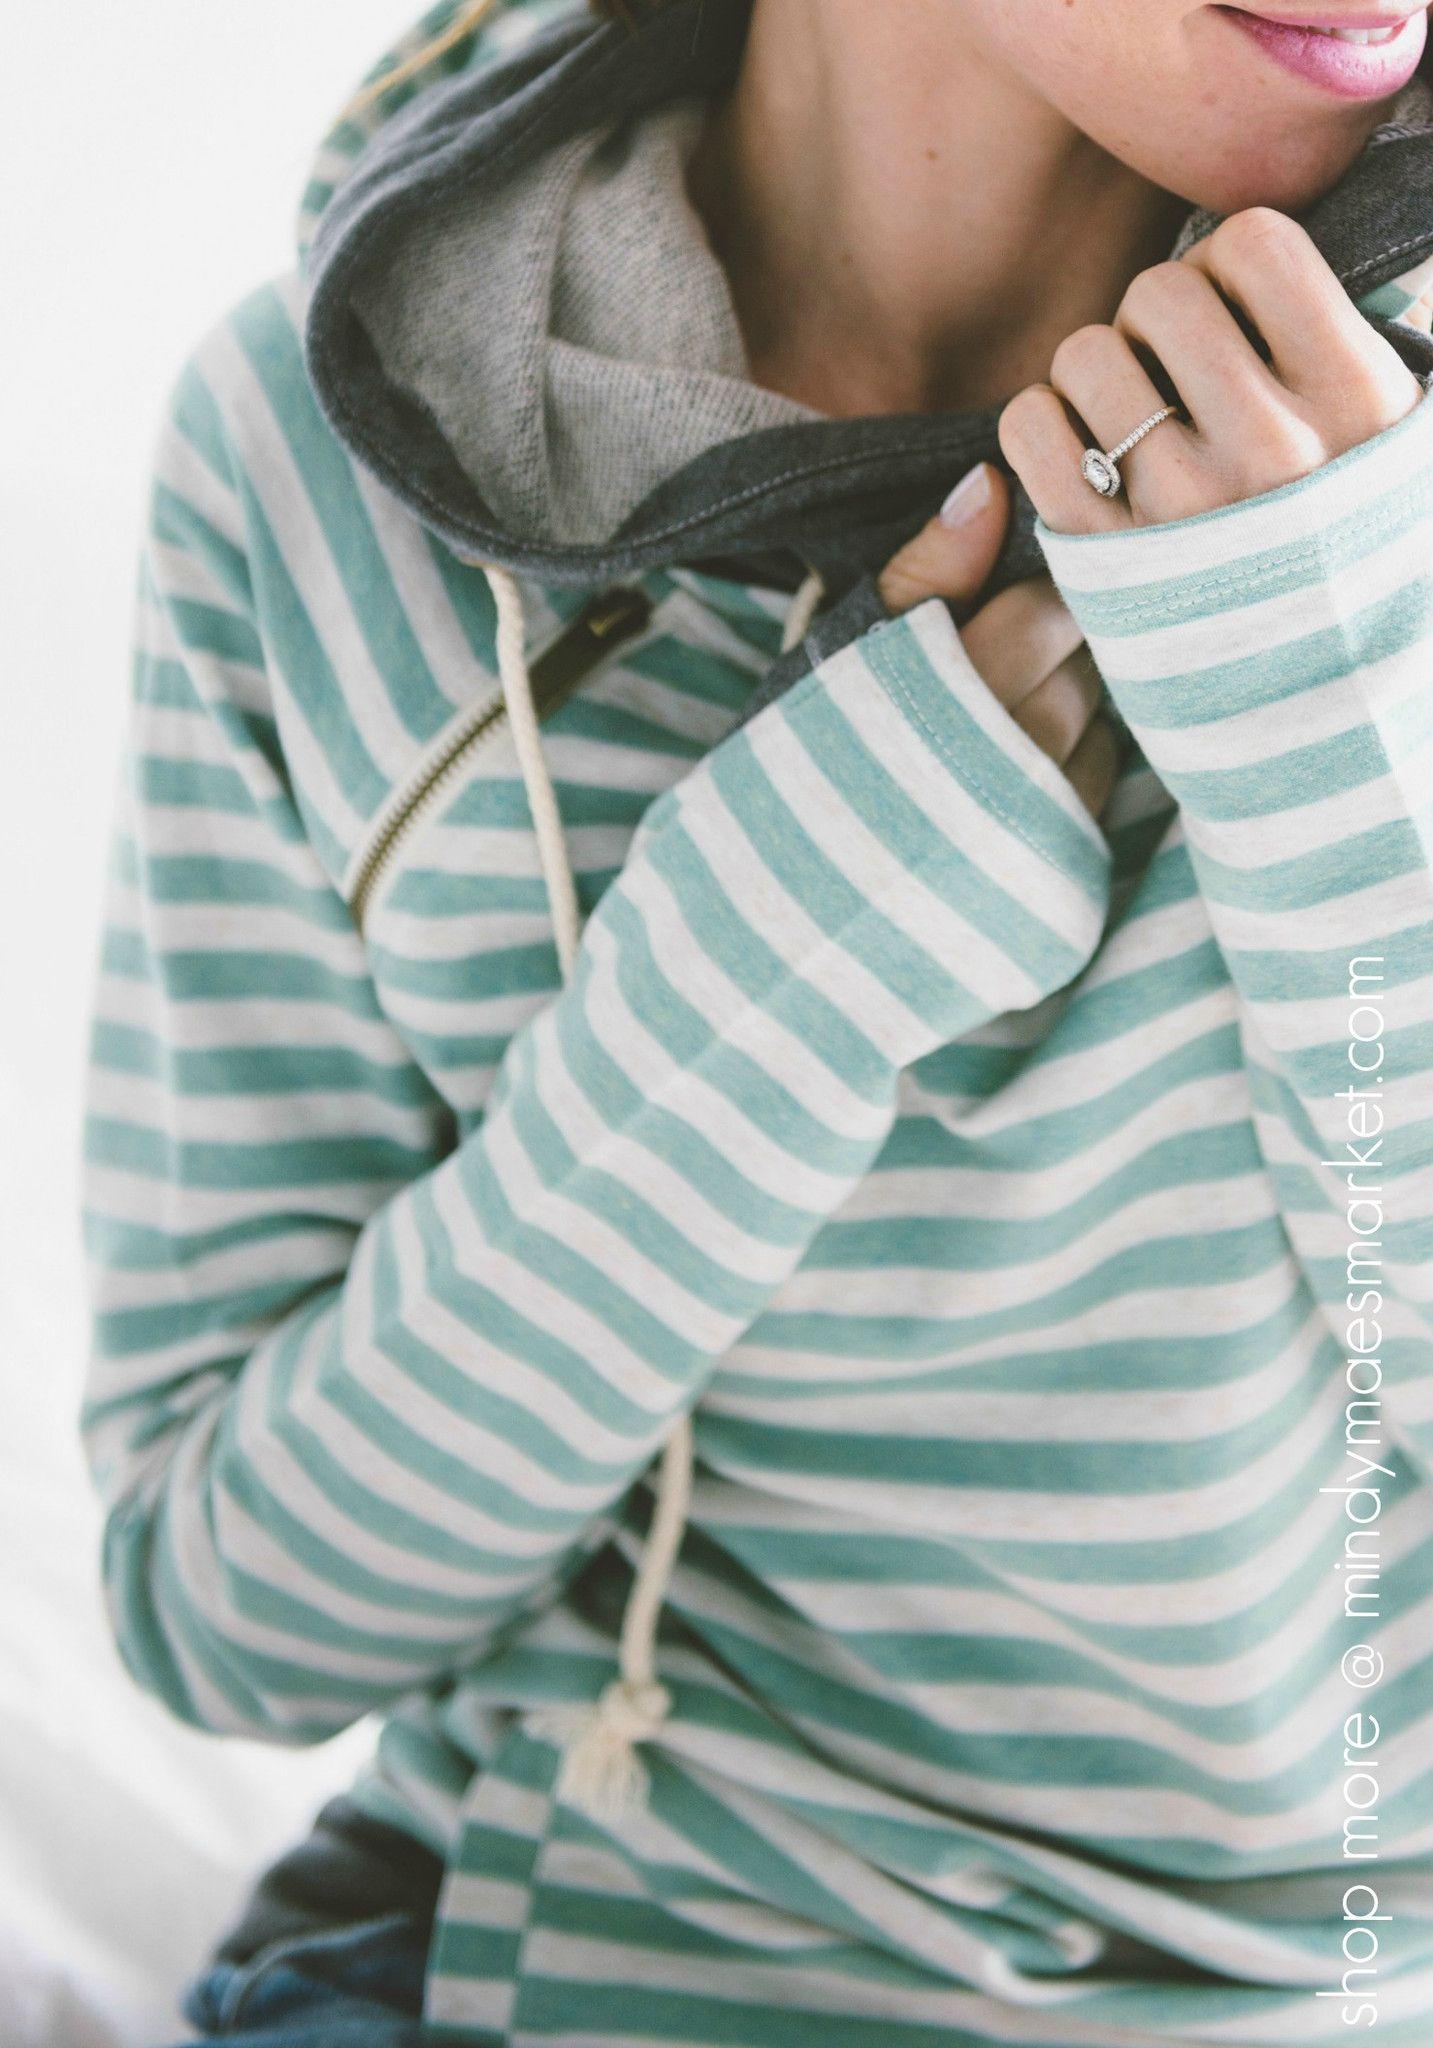 Double Hooded Sweatshirt Mint   Style, Mindy maes market